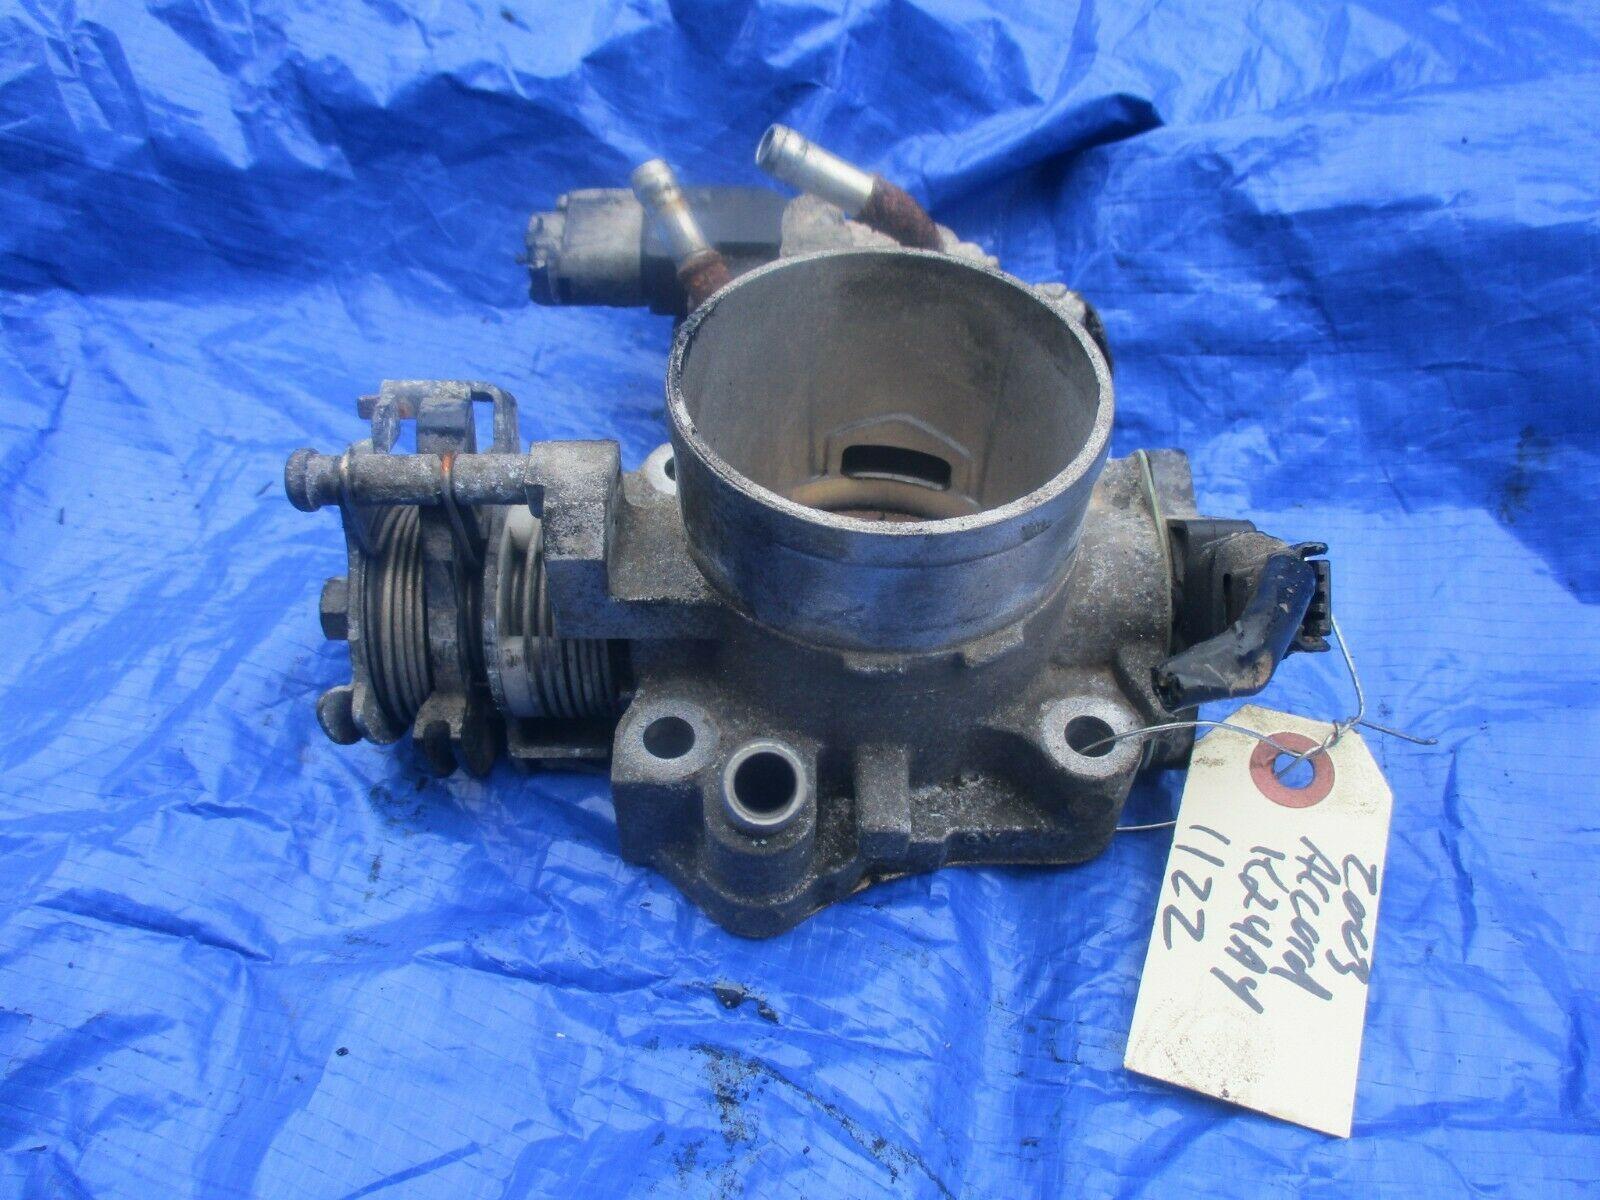 03-04 Honda Accord K24A4 throttle body assembly engine motor OEM K24 1122